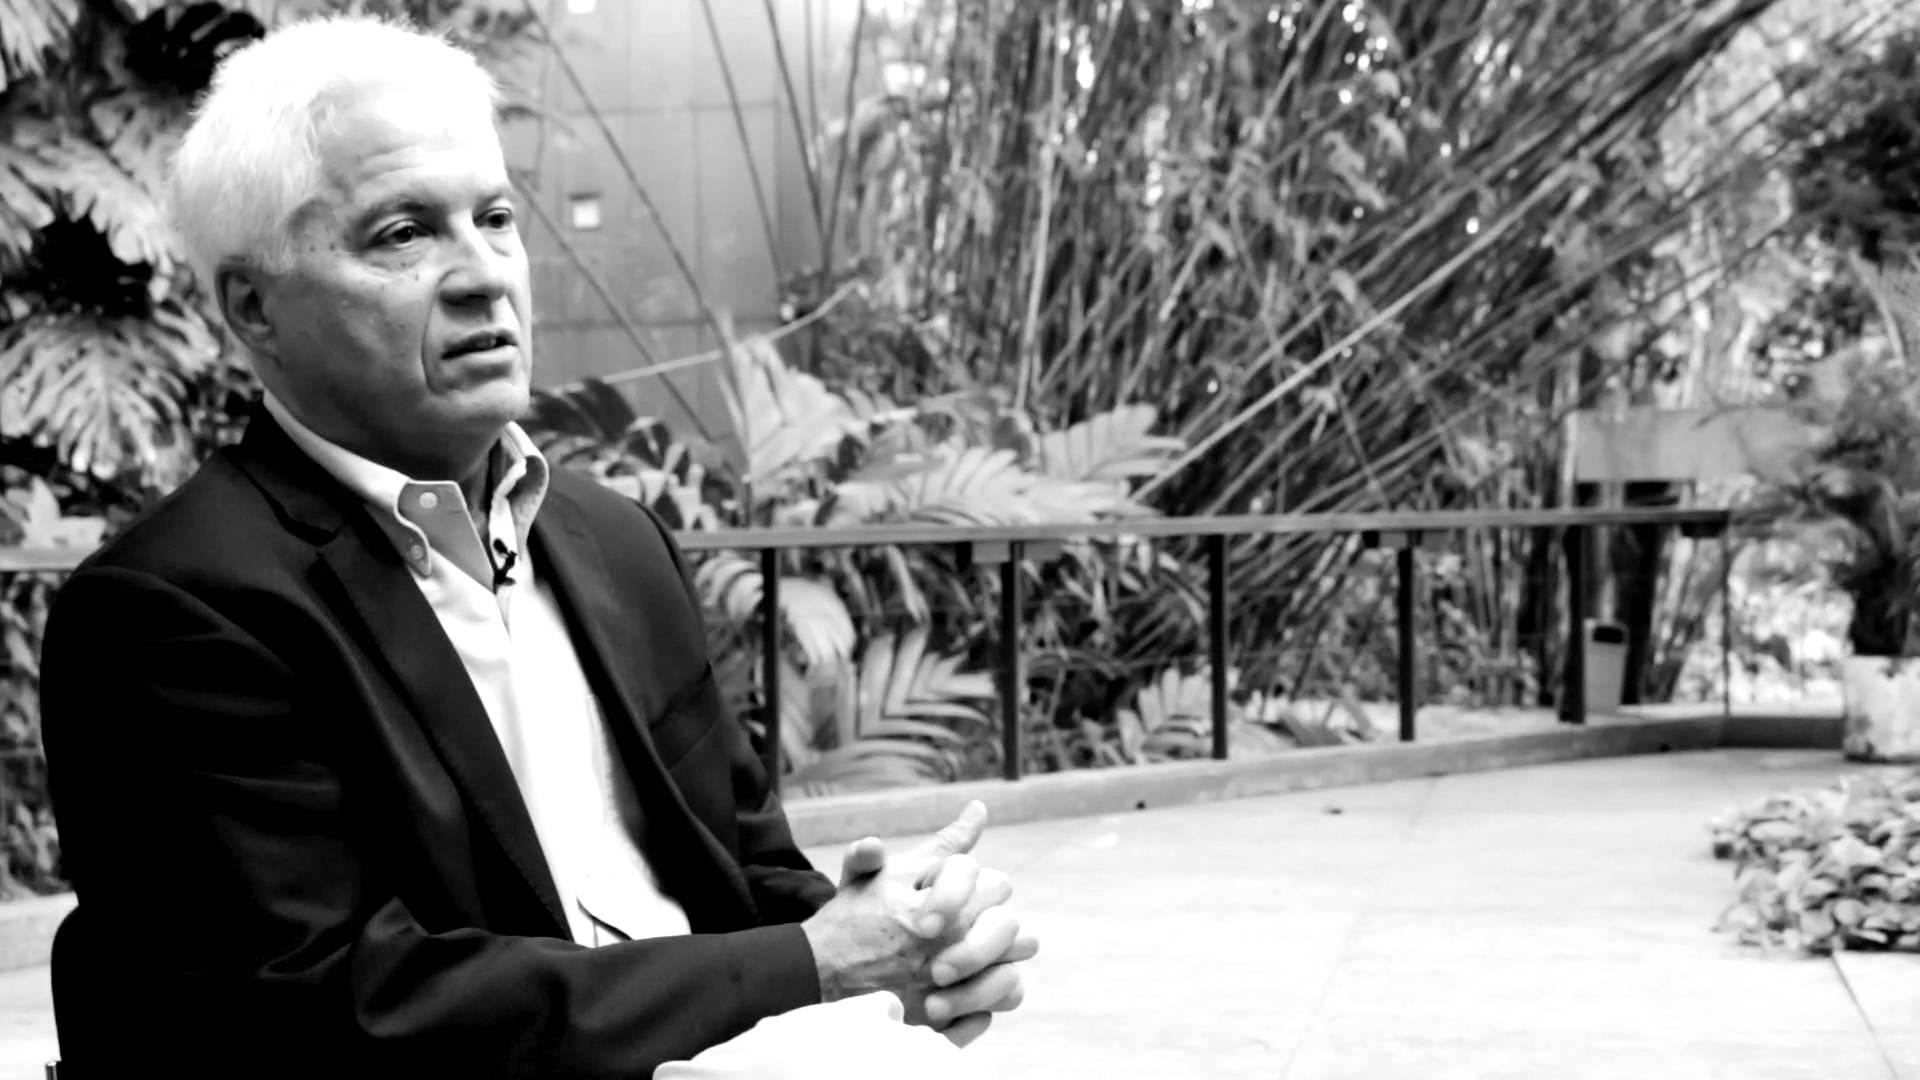 Paulo Gurgel Valente recorda sua mãe, Clarice Lispector